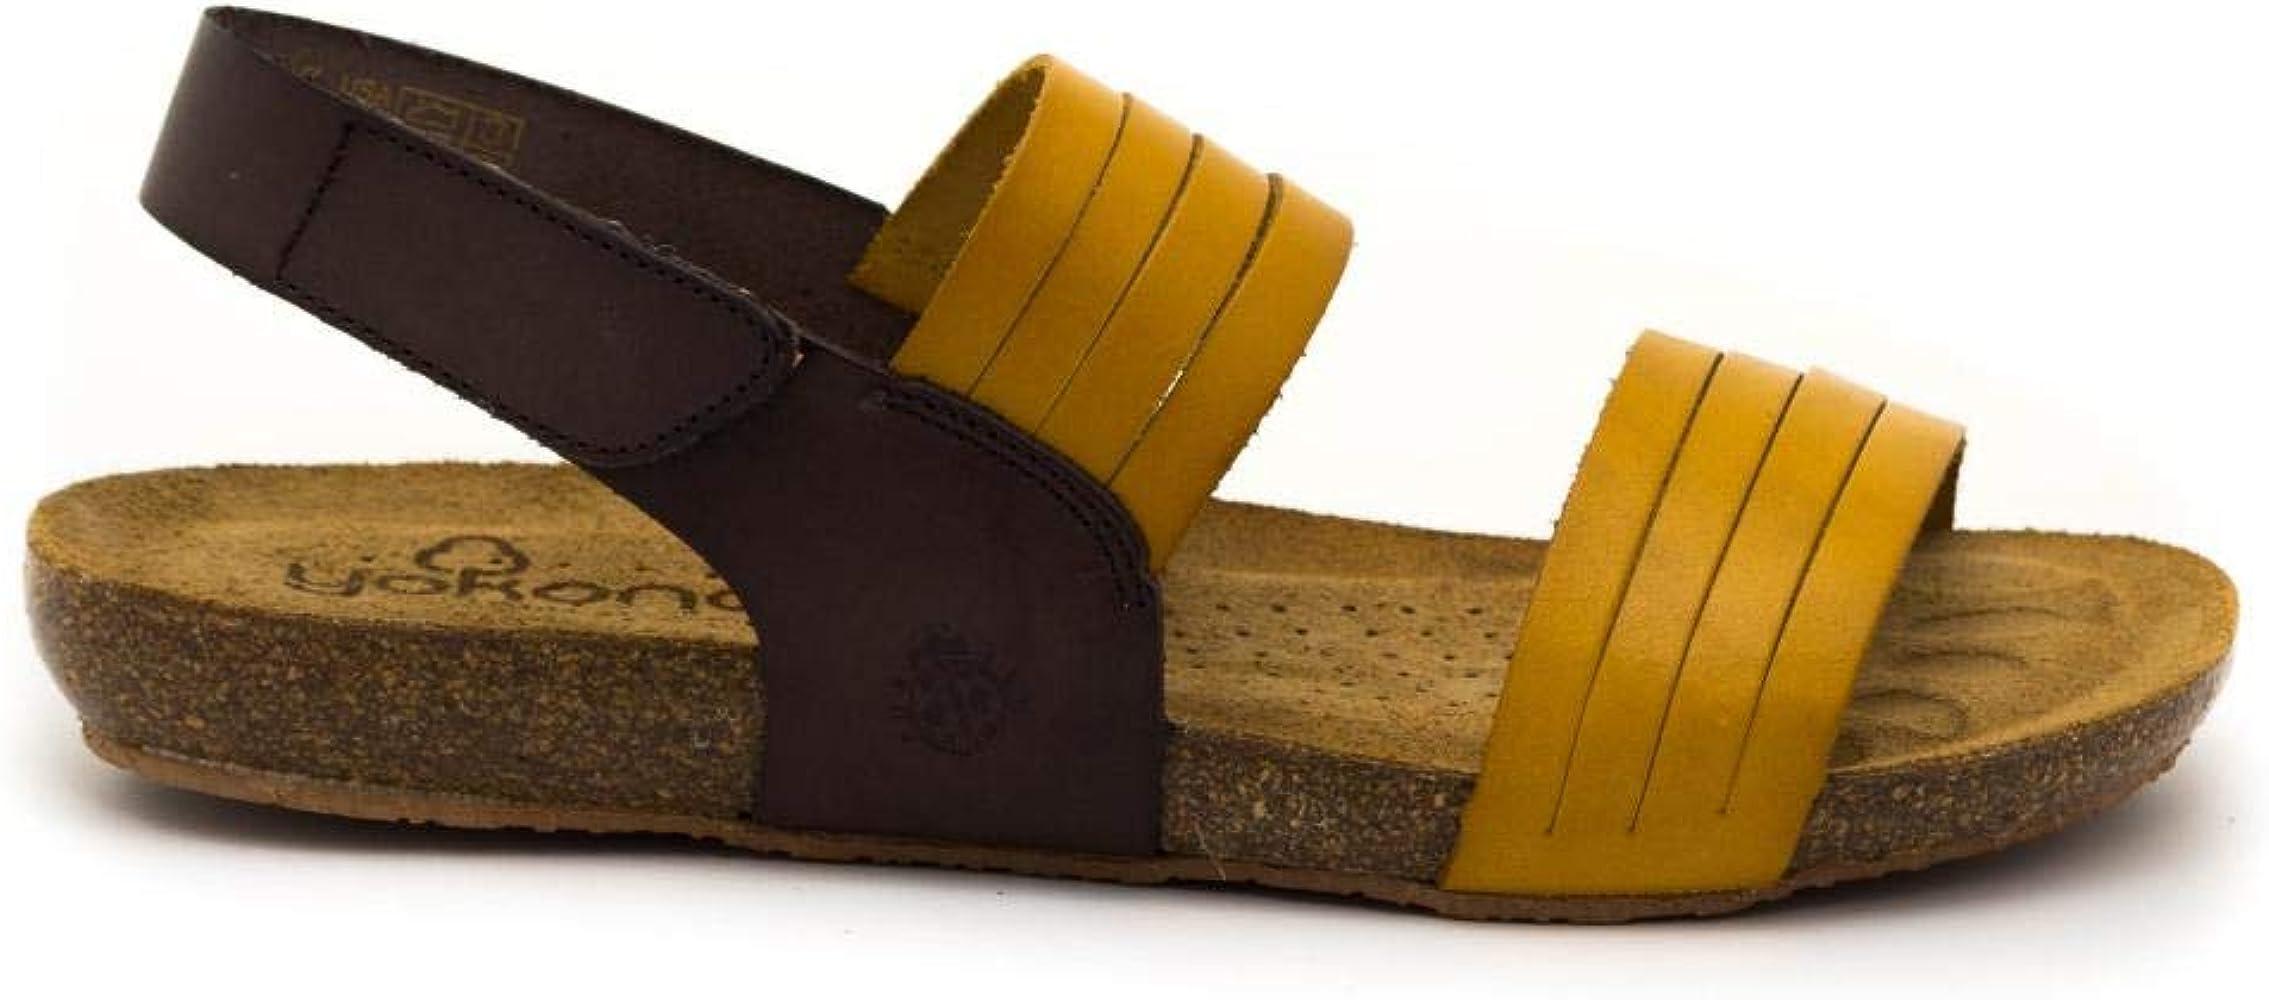 Sandalias de Cuero Fabricadas en Espa/ña Yokono Beach 142 Mostaza Marr/ón